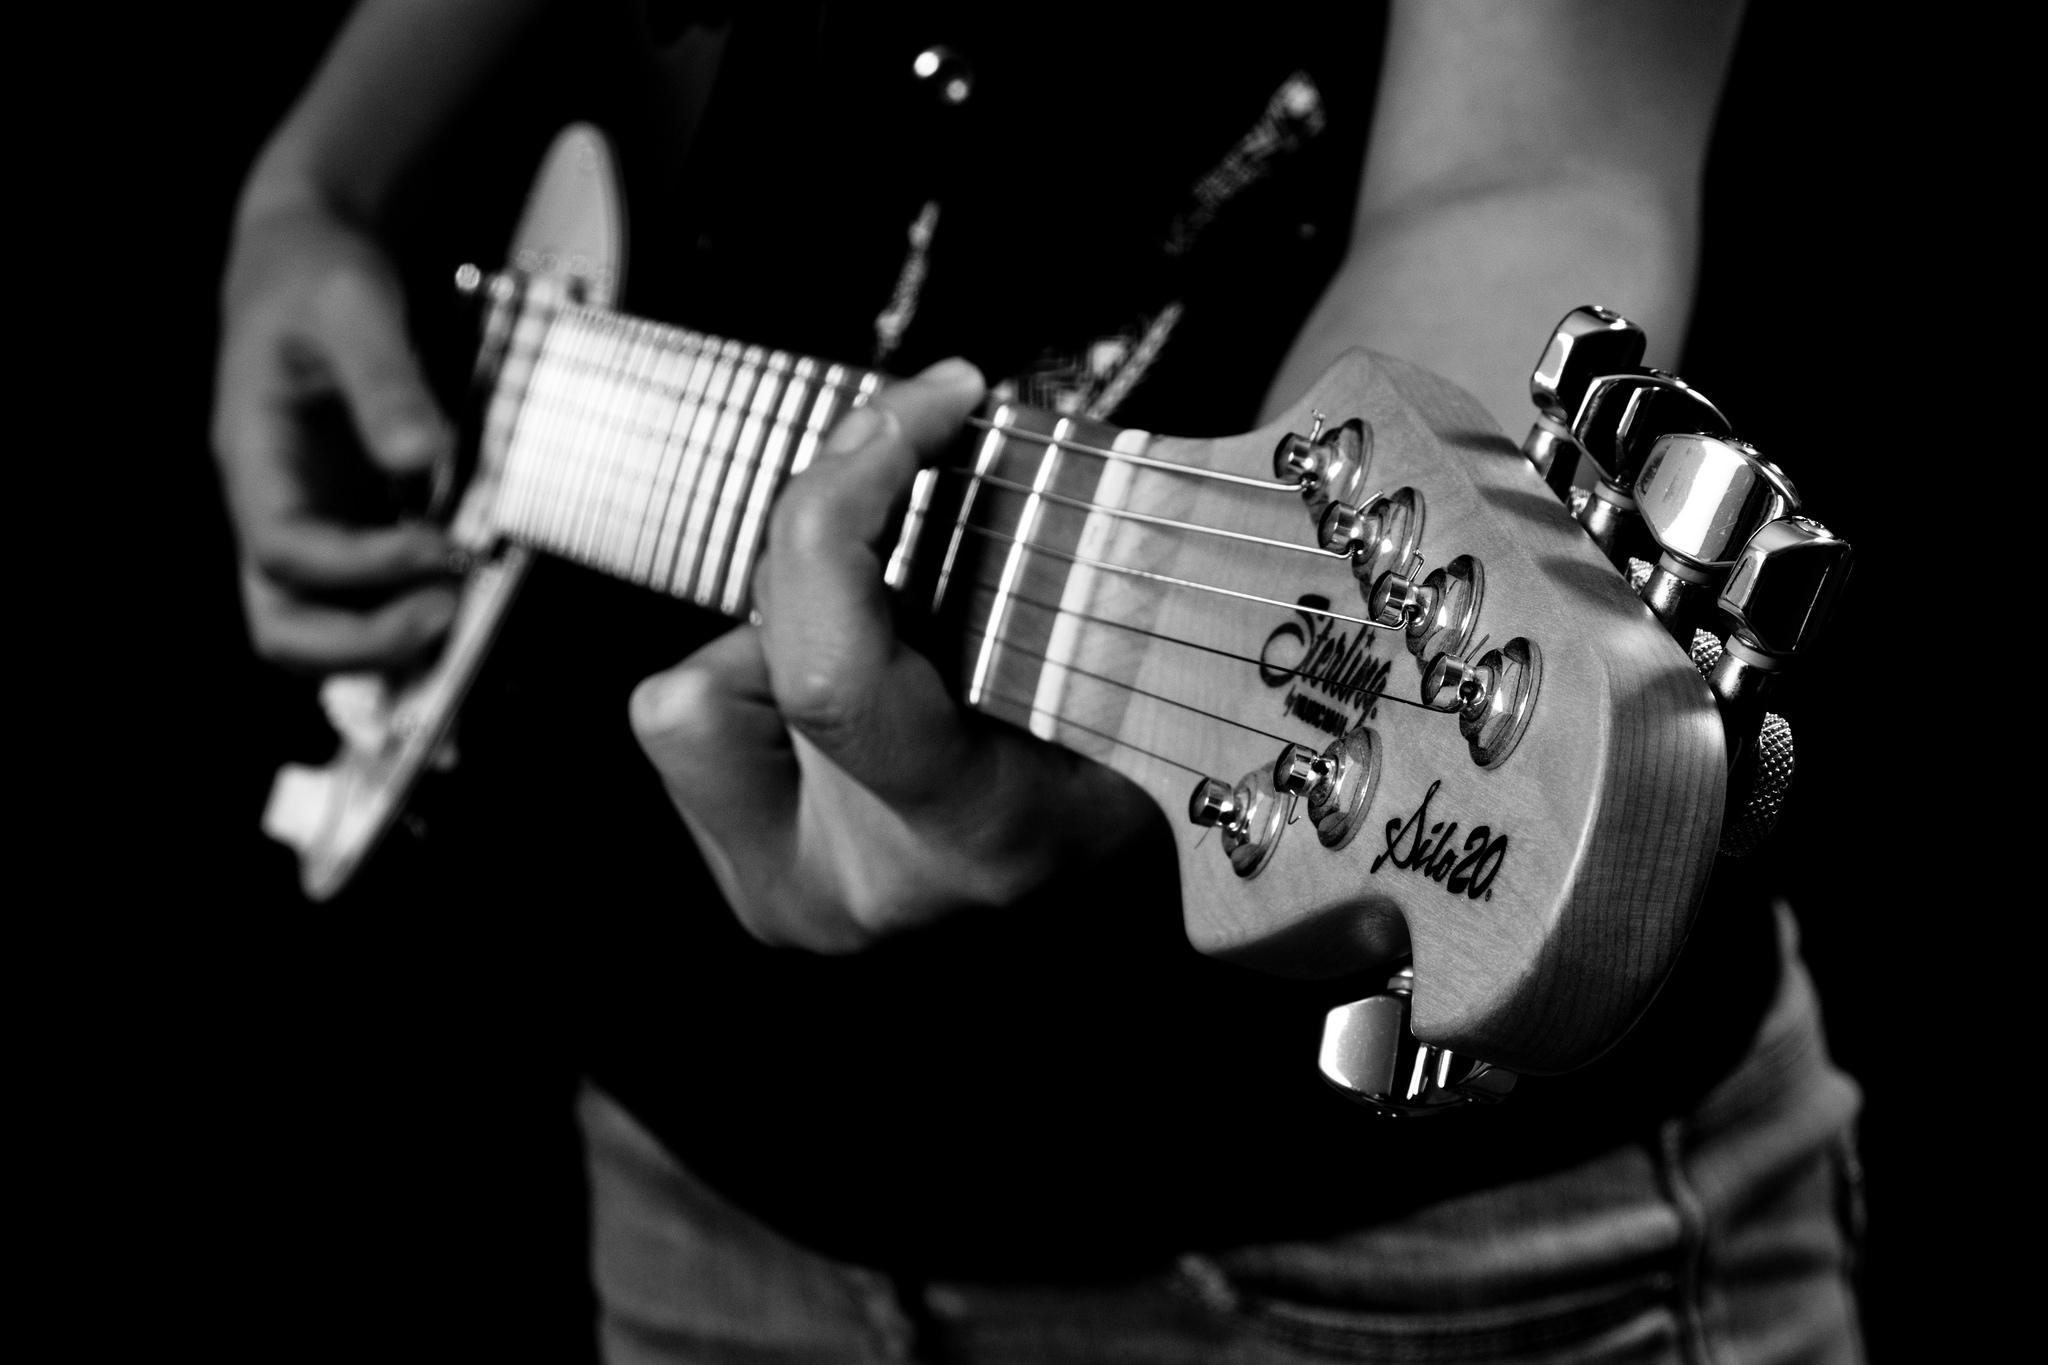 לימוד גיטרה / לימוד גיטרה למתחילים